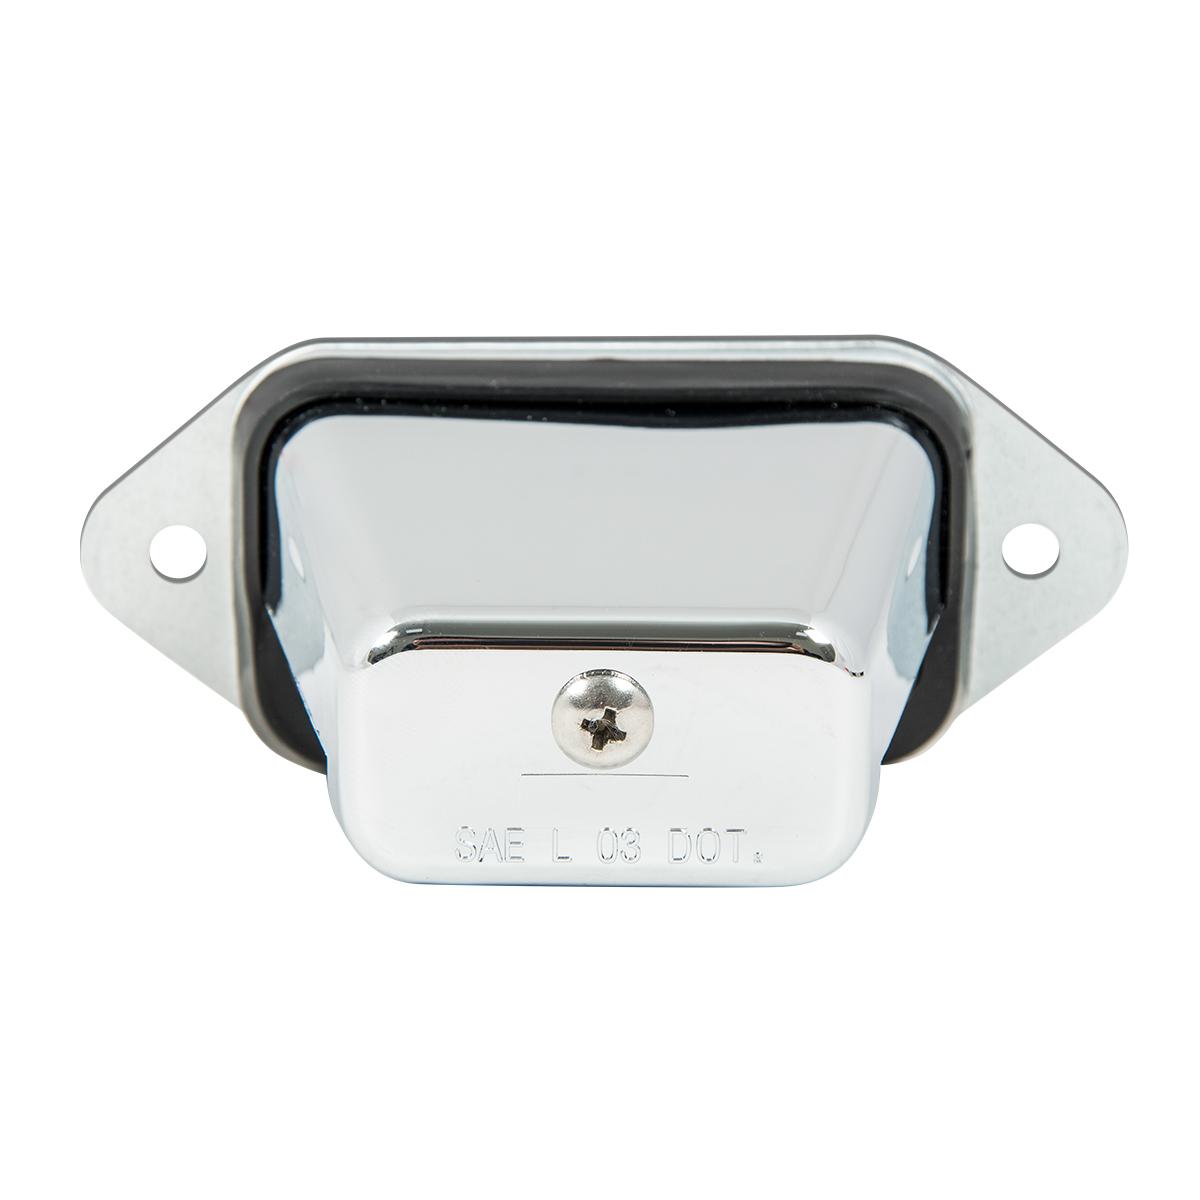 81737 Rectangular License LED Light w/ Surface Mount Screws